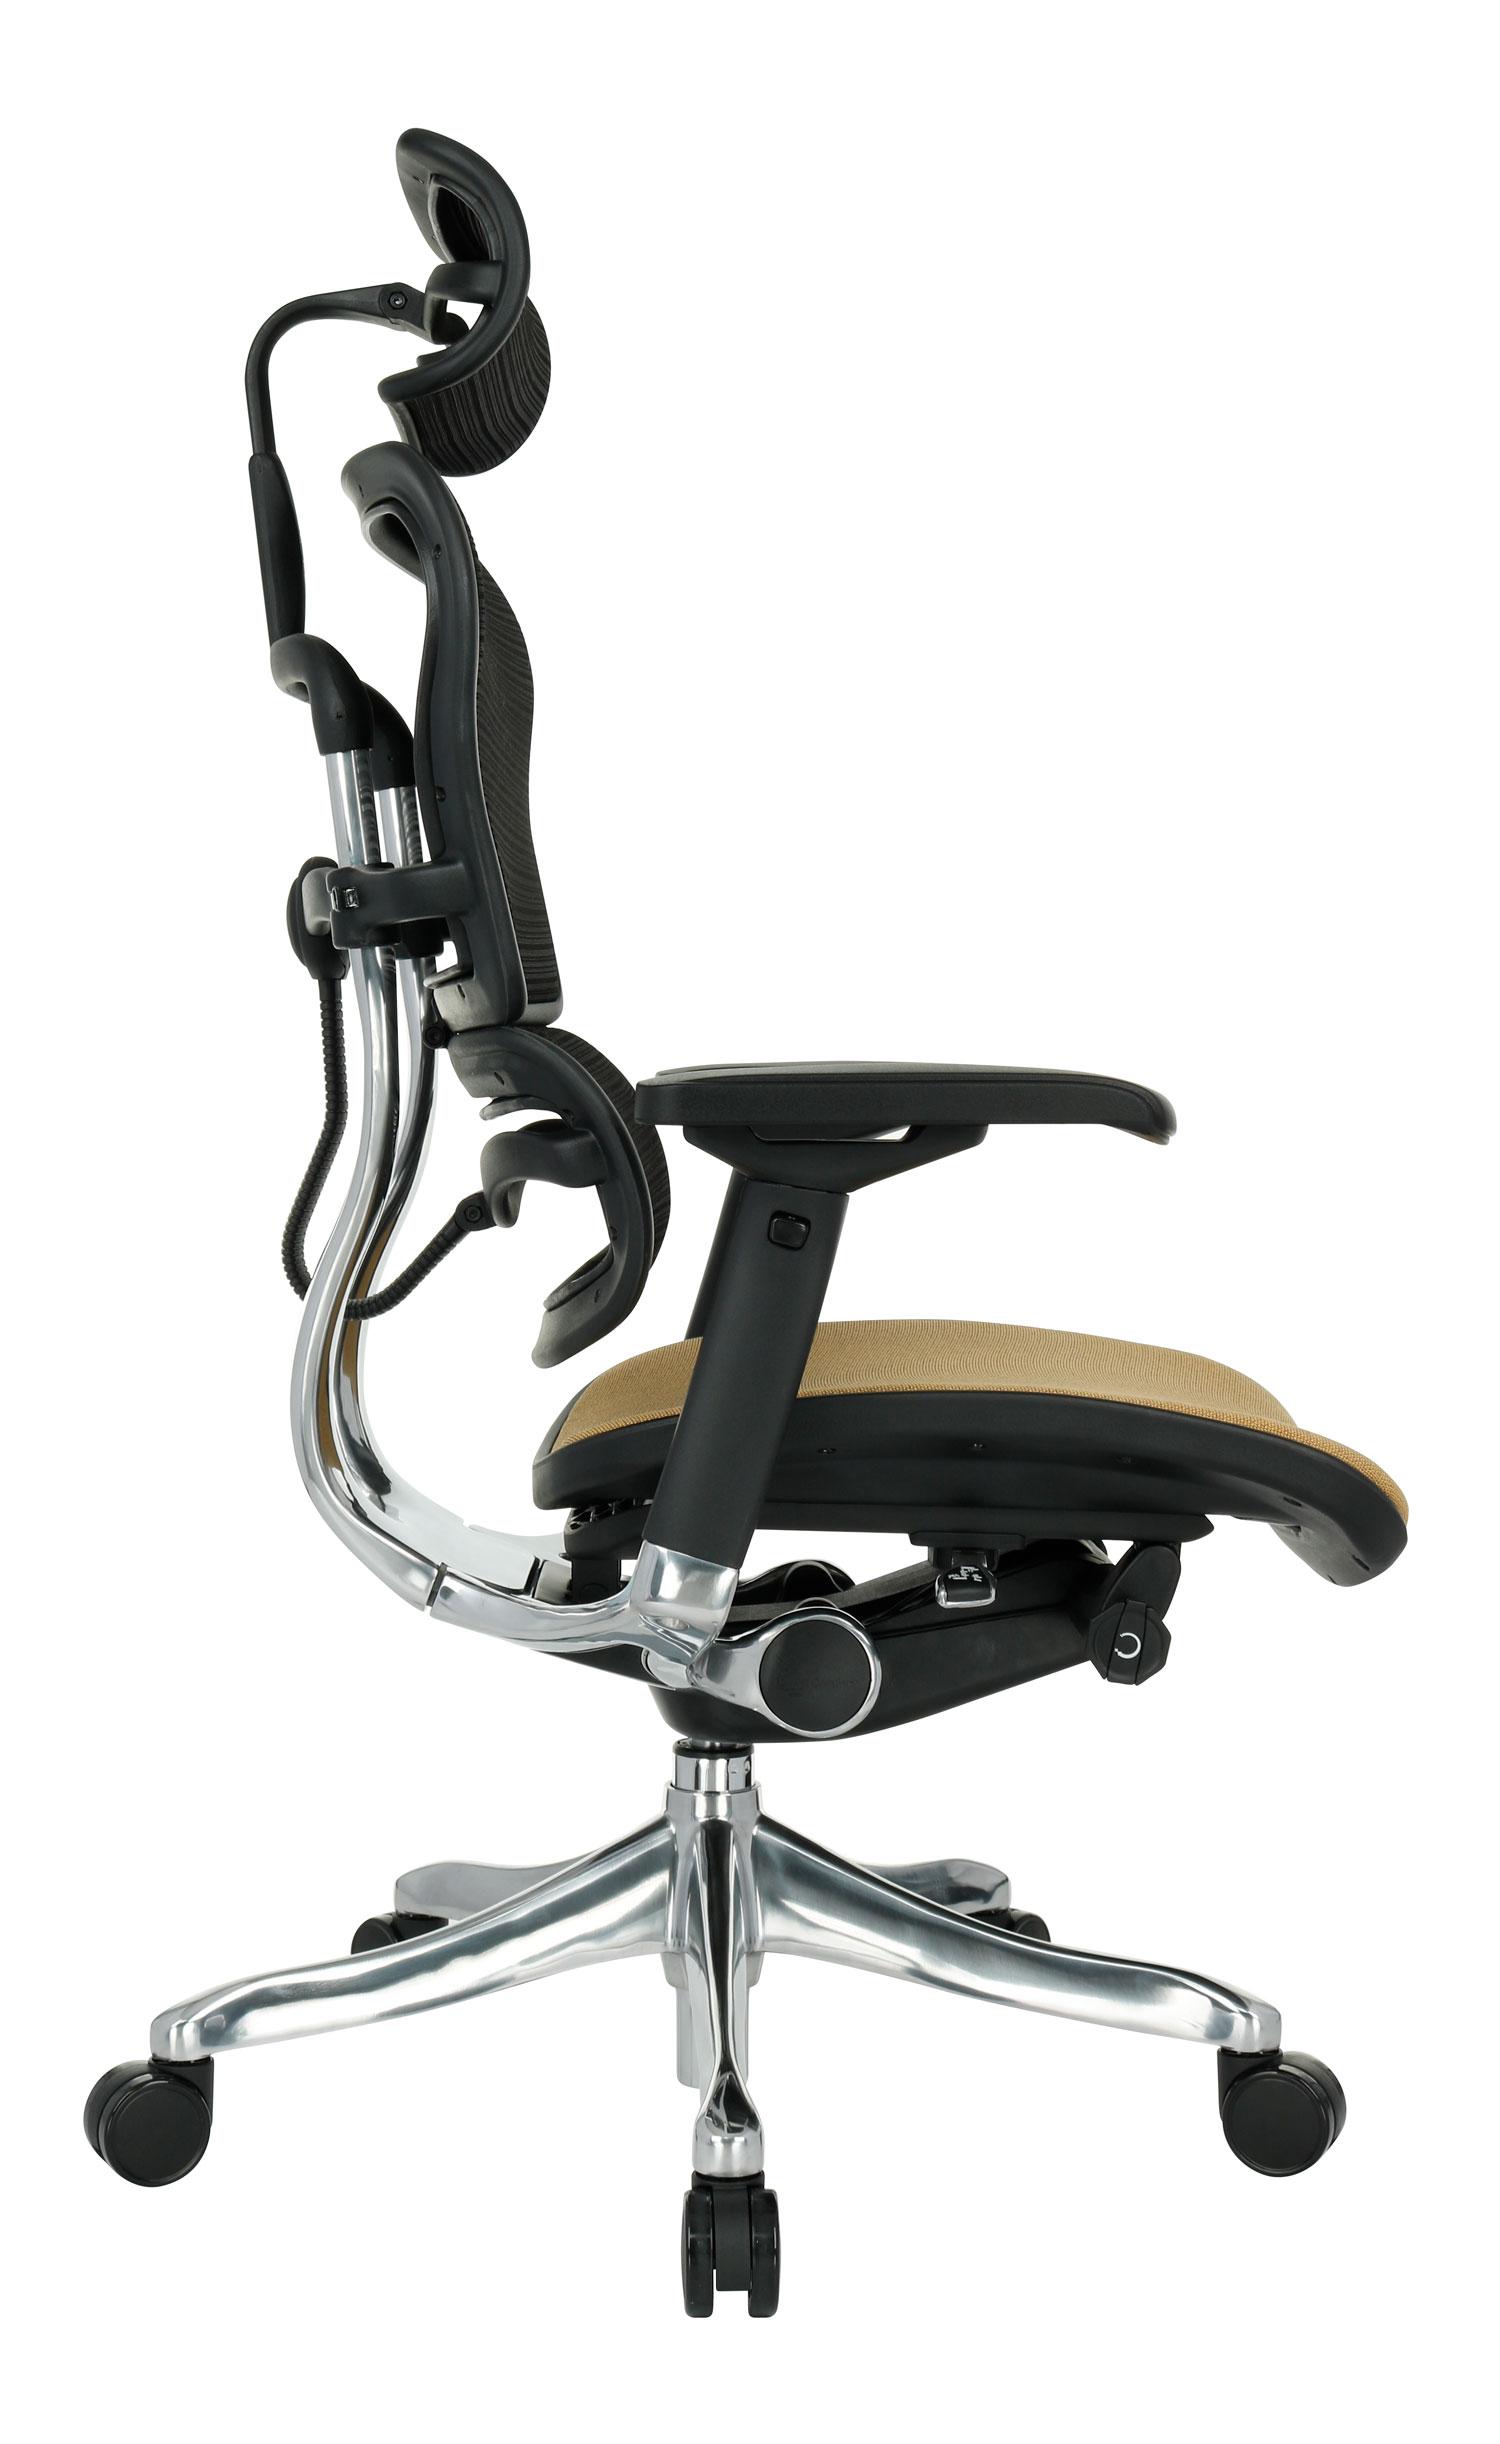 Ergohuman Plus Elite Color, Backrest: KMD 31, Seat: Cura CU07